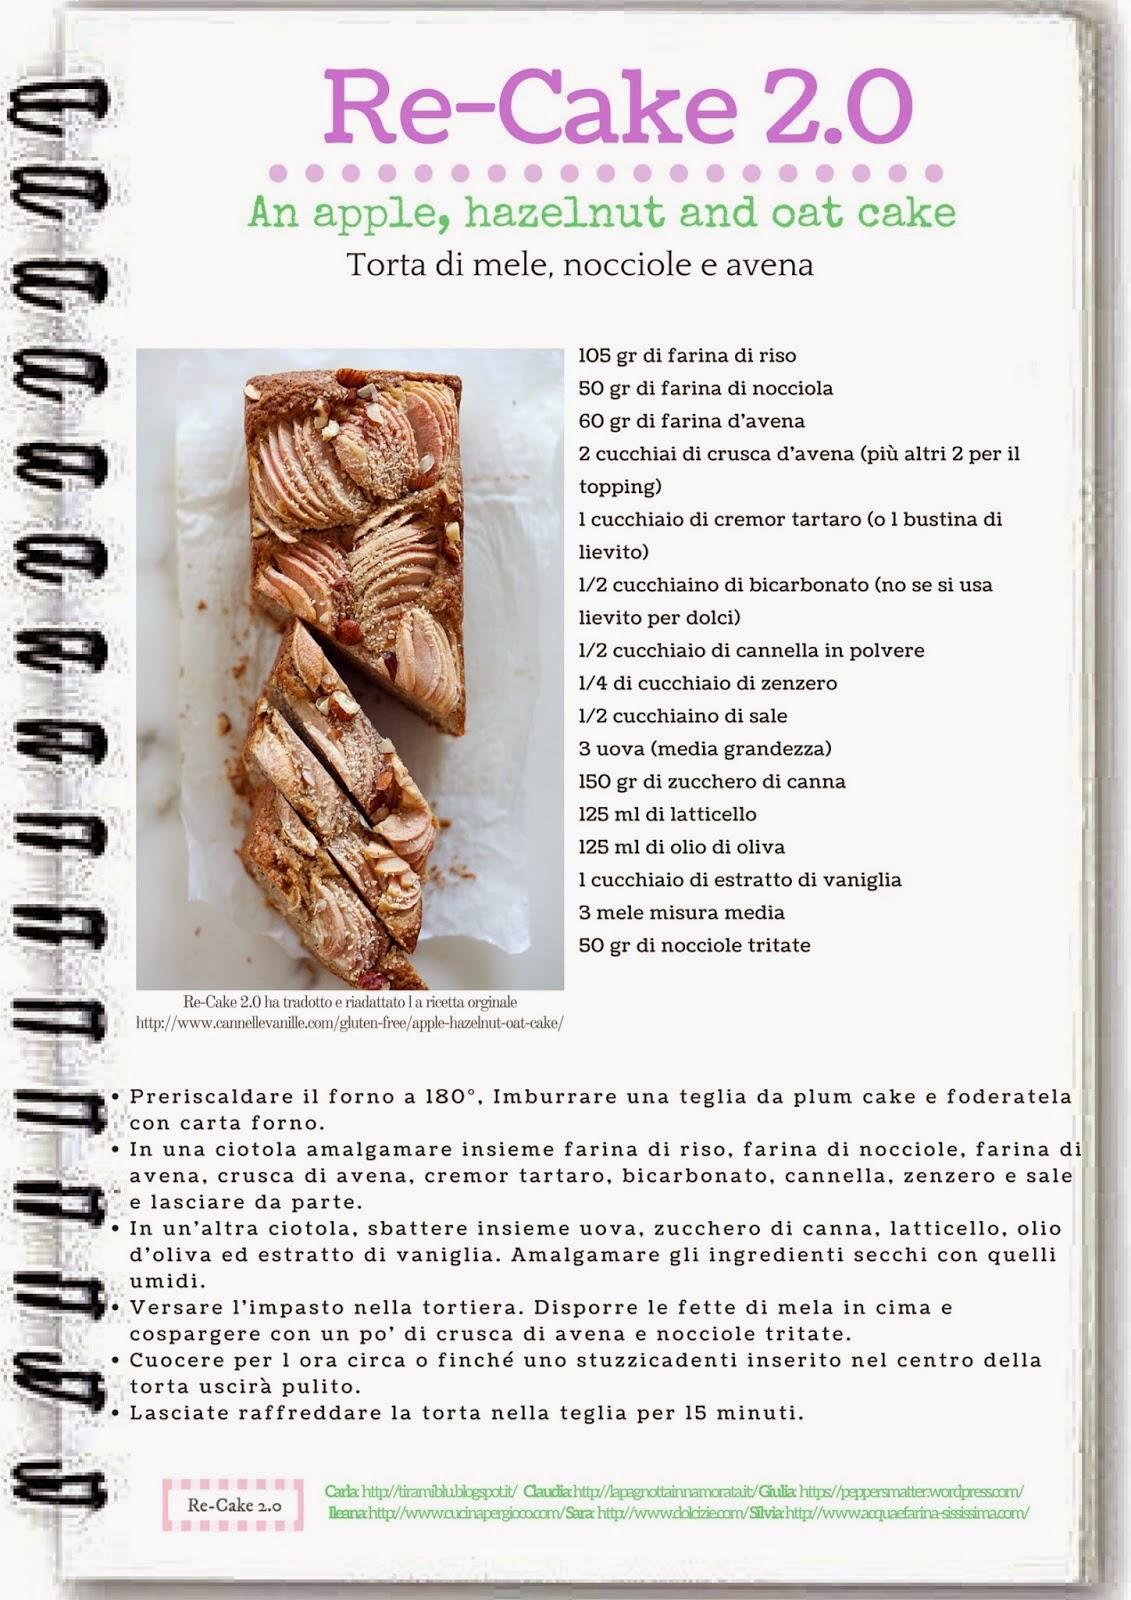 http://www.dolcizie.com/2015/02/torta-di-mele-nocciole-e-avena-re-cake.html